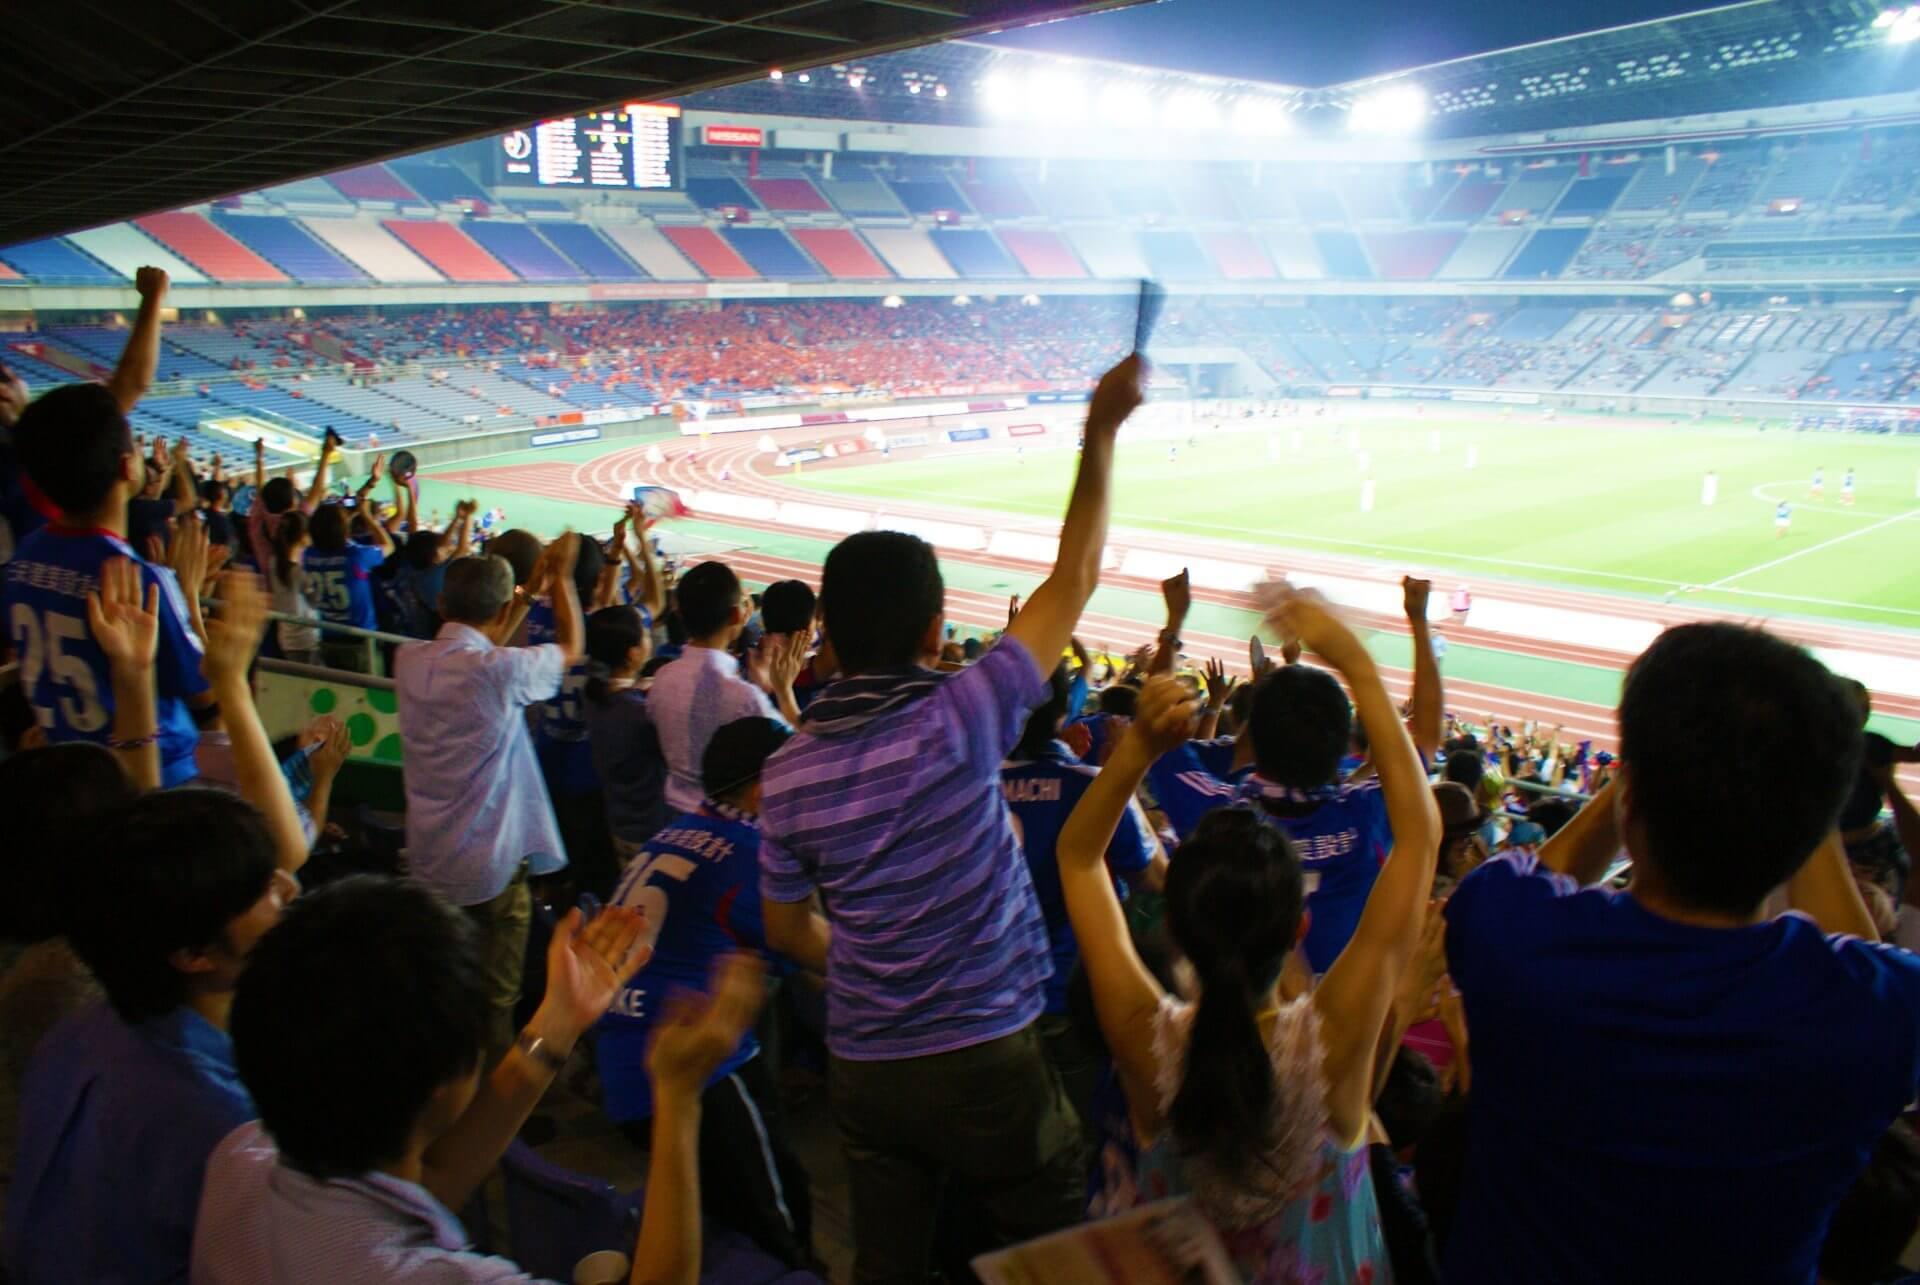 DAZN(ダ・ゾーン)で見られるサッカー中継まとめ!Jリーグも欧州5大リーグも放送!